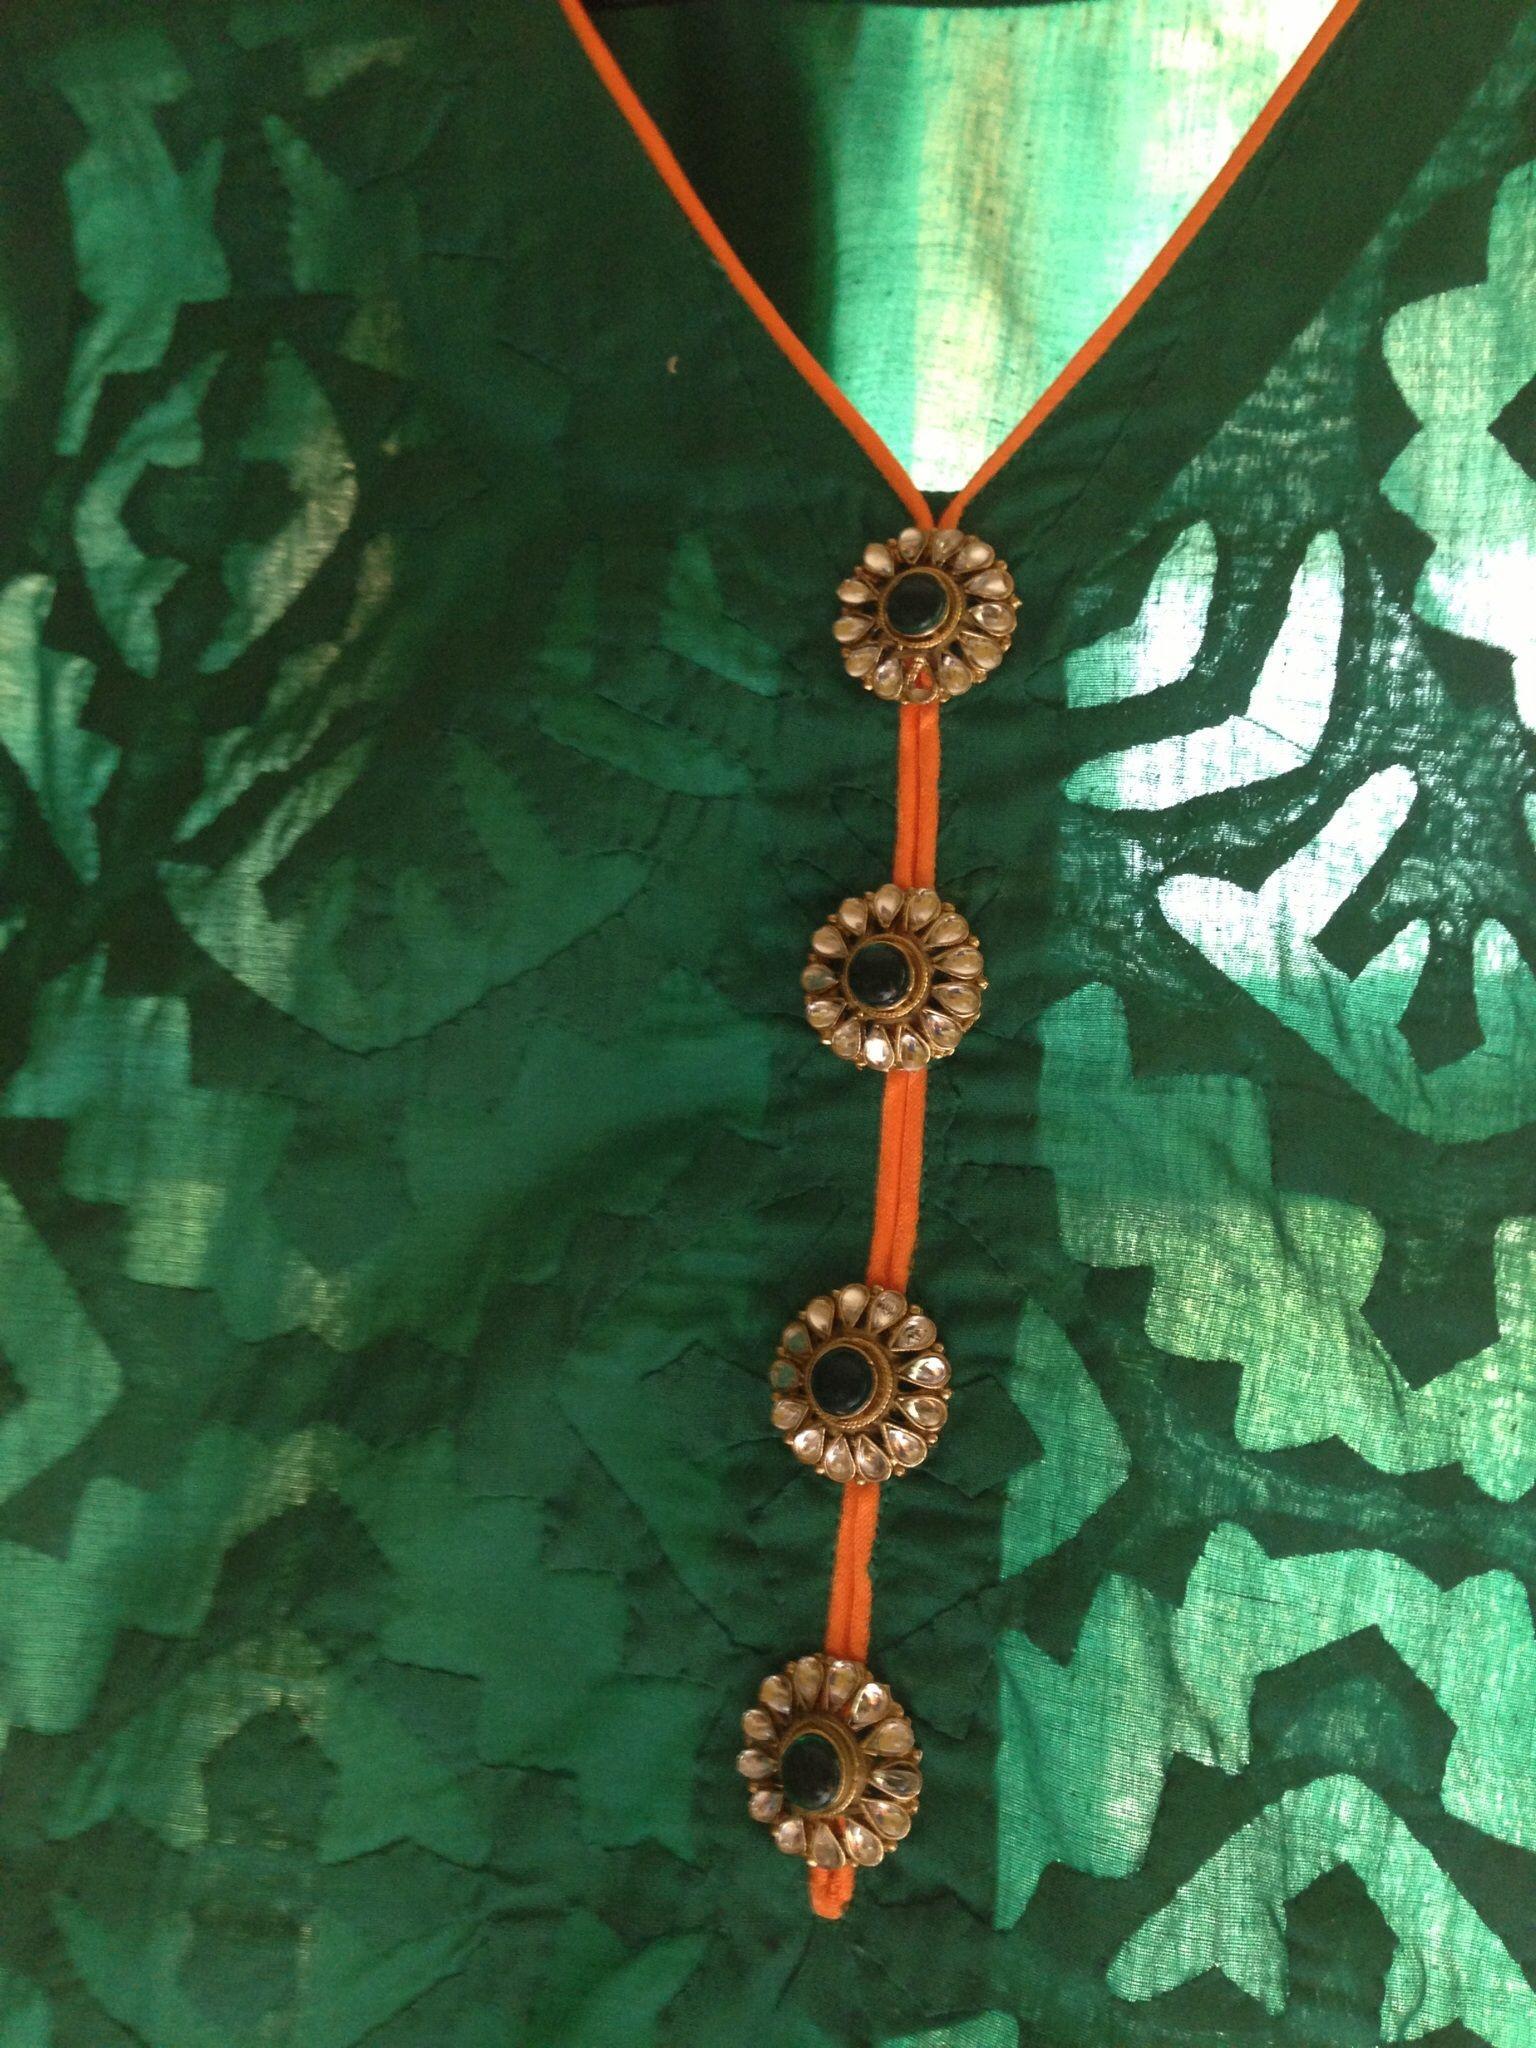 Shirt design ideas pakistani - Rilli Shirts Handmade By Women Artisans In Khairpur Embroidery Ideas Artisanspakistanapplybed Sheetshandmadedesignsblousesstore